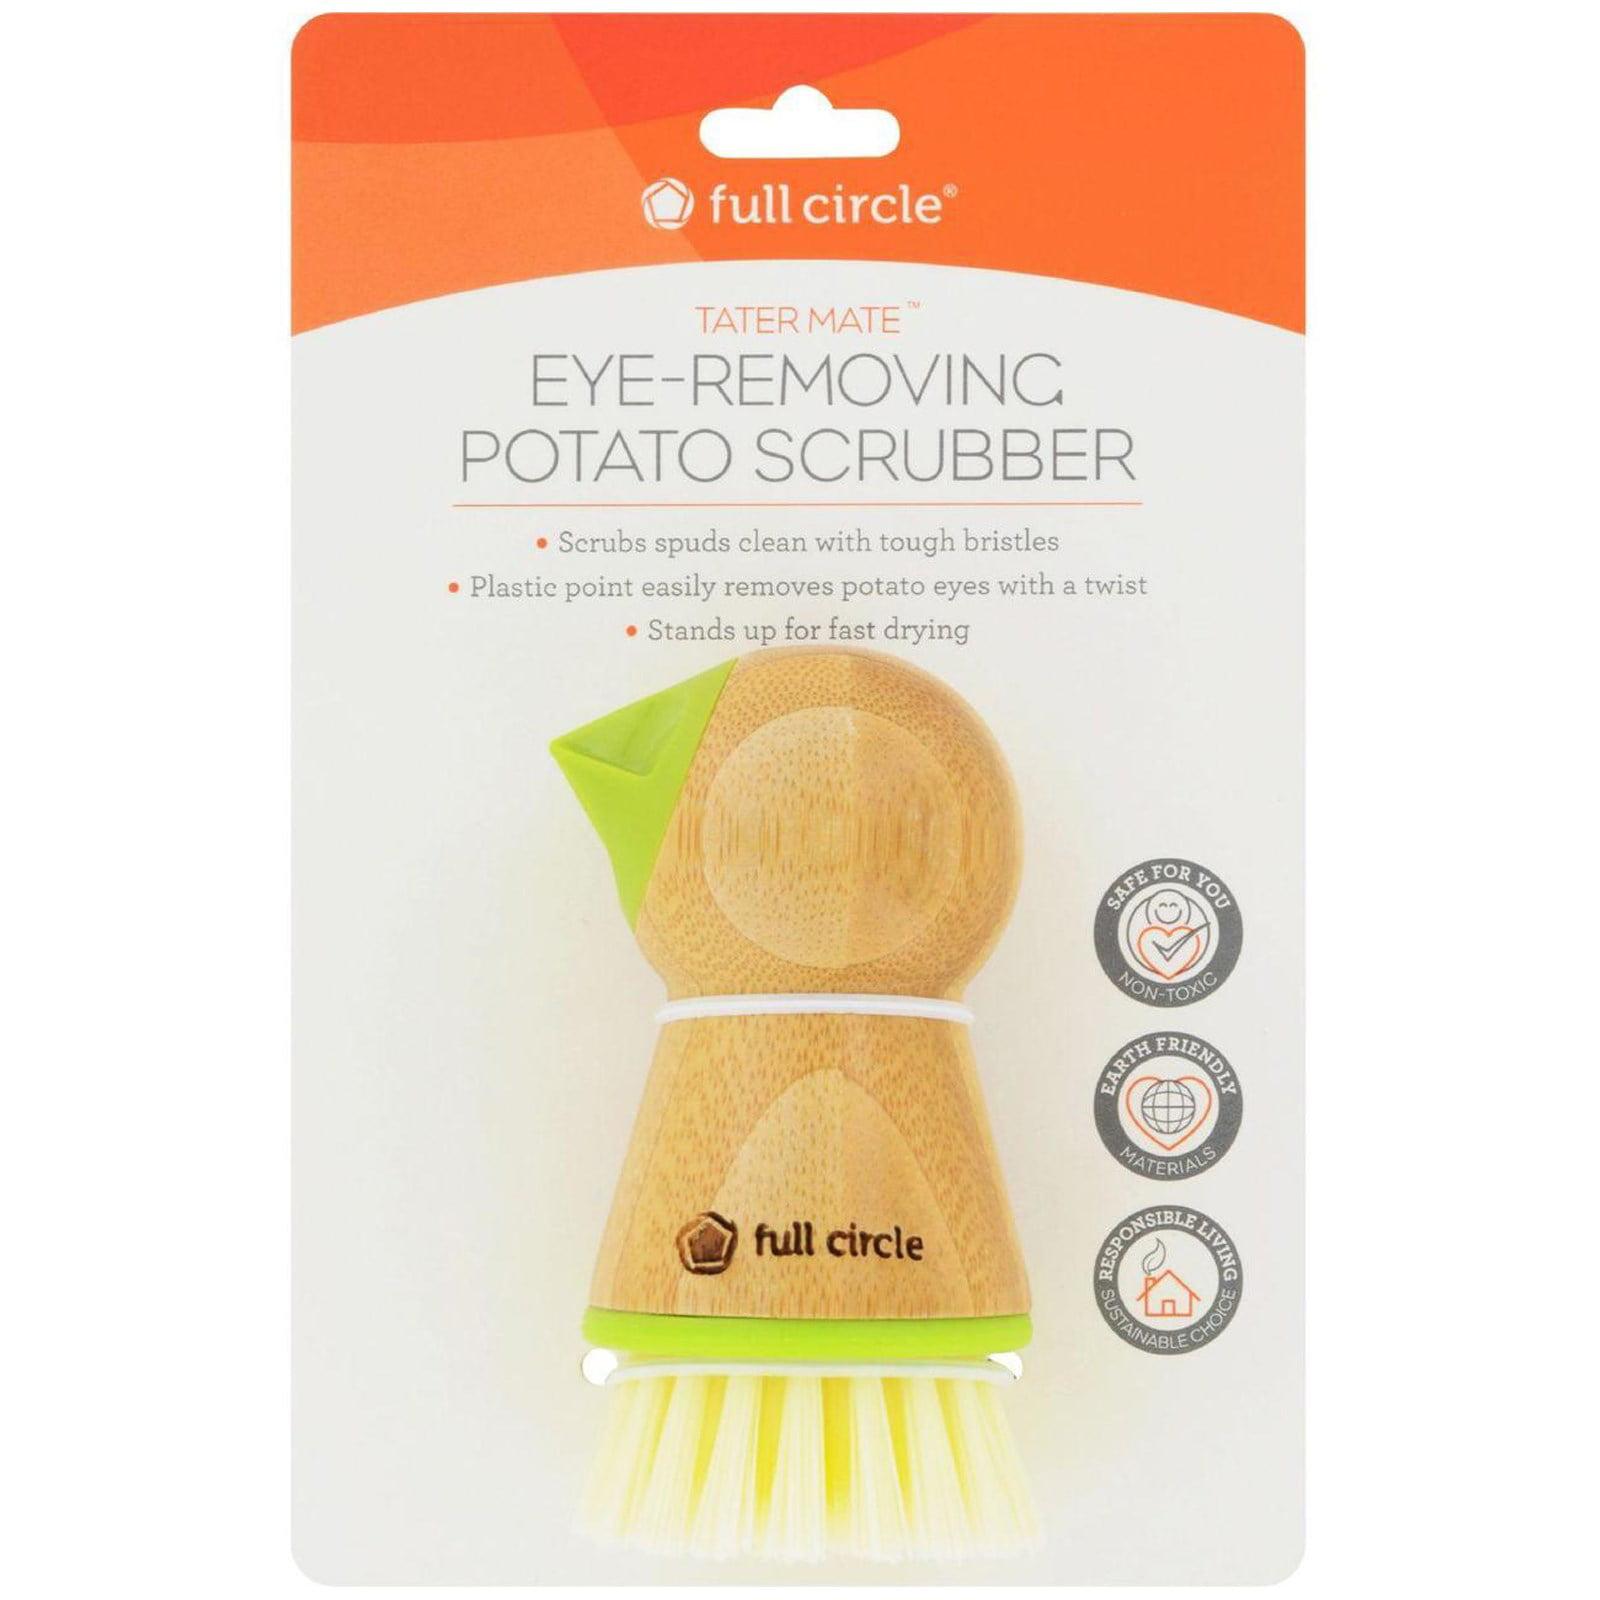 Full Circle, Tater Mate, Eye-Removing Potato Scrubber, 1 Brush(pack of 2)